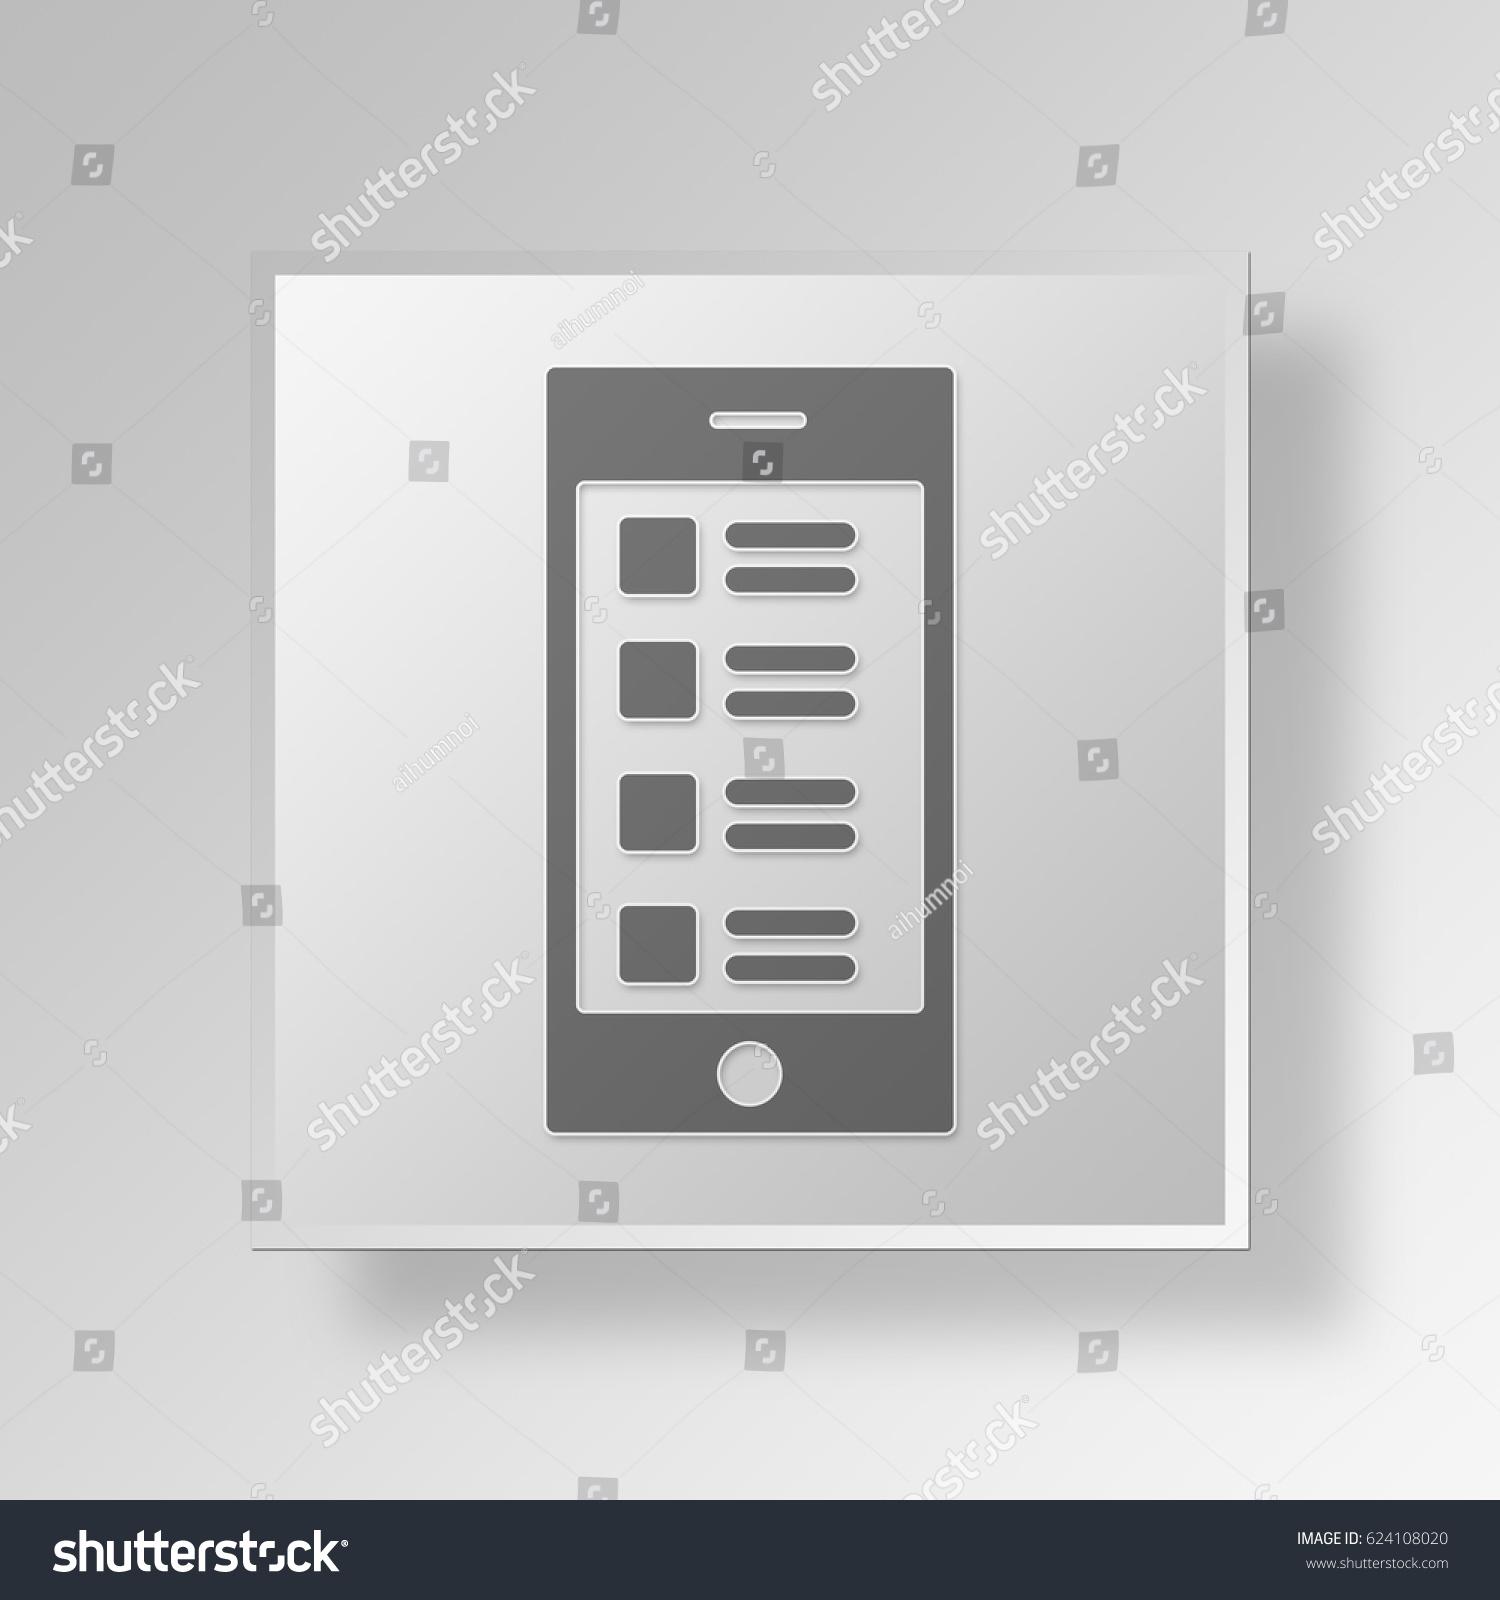 3d symbol gray square app store stock illustration 624108020 3d symbol gray square app store icon business concept buycottarizona Images